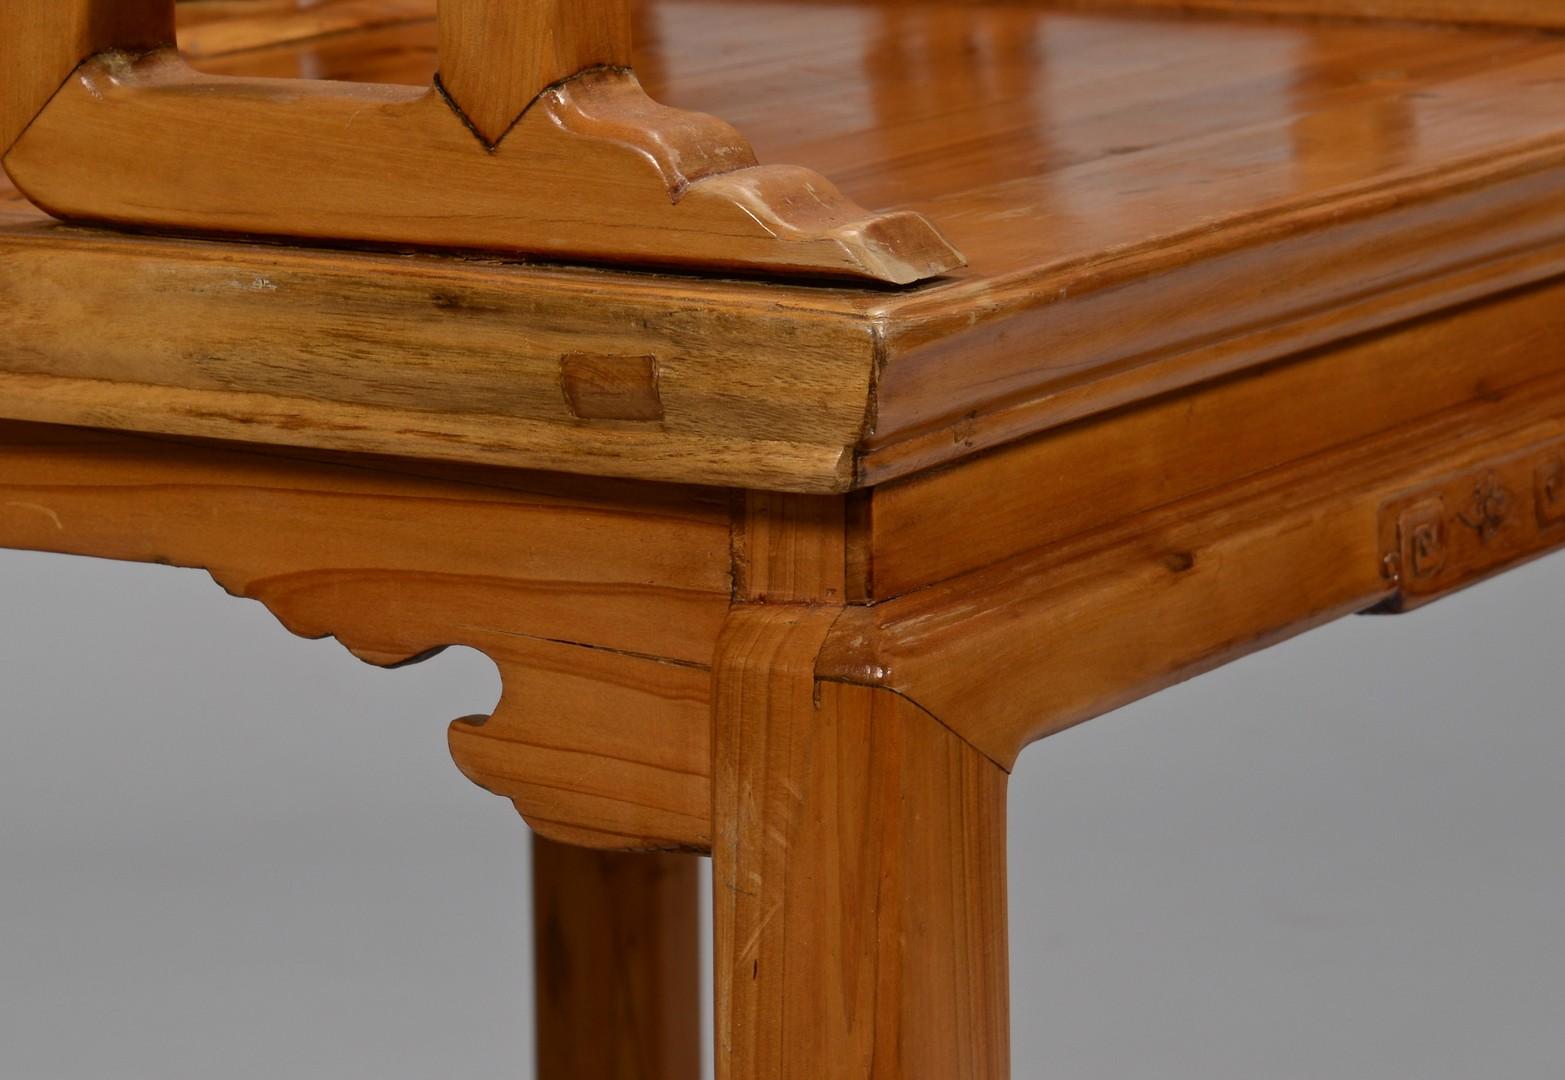 Lot 3832418: Chinese Hardwood Throne Chair